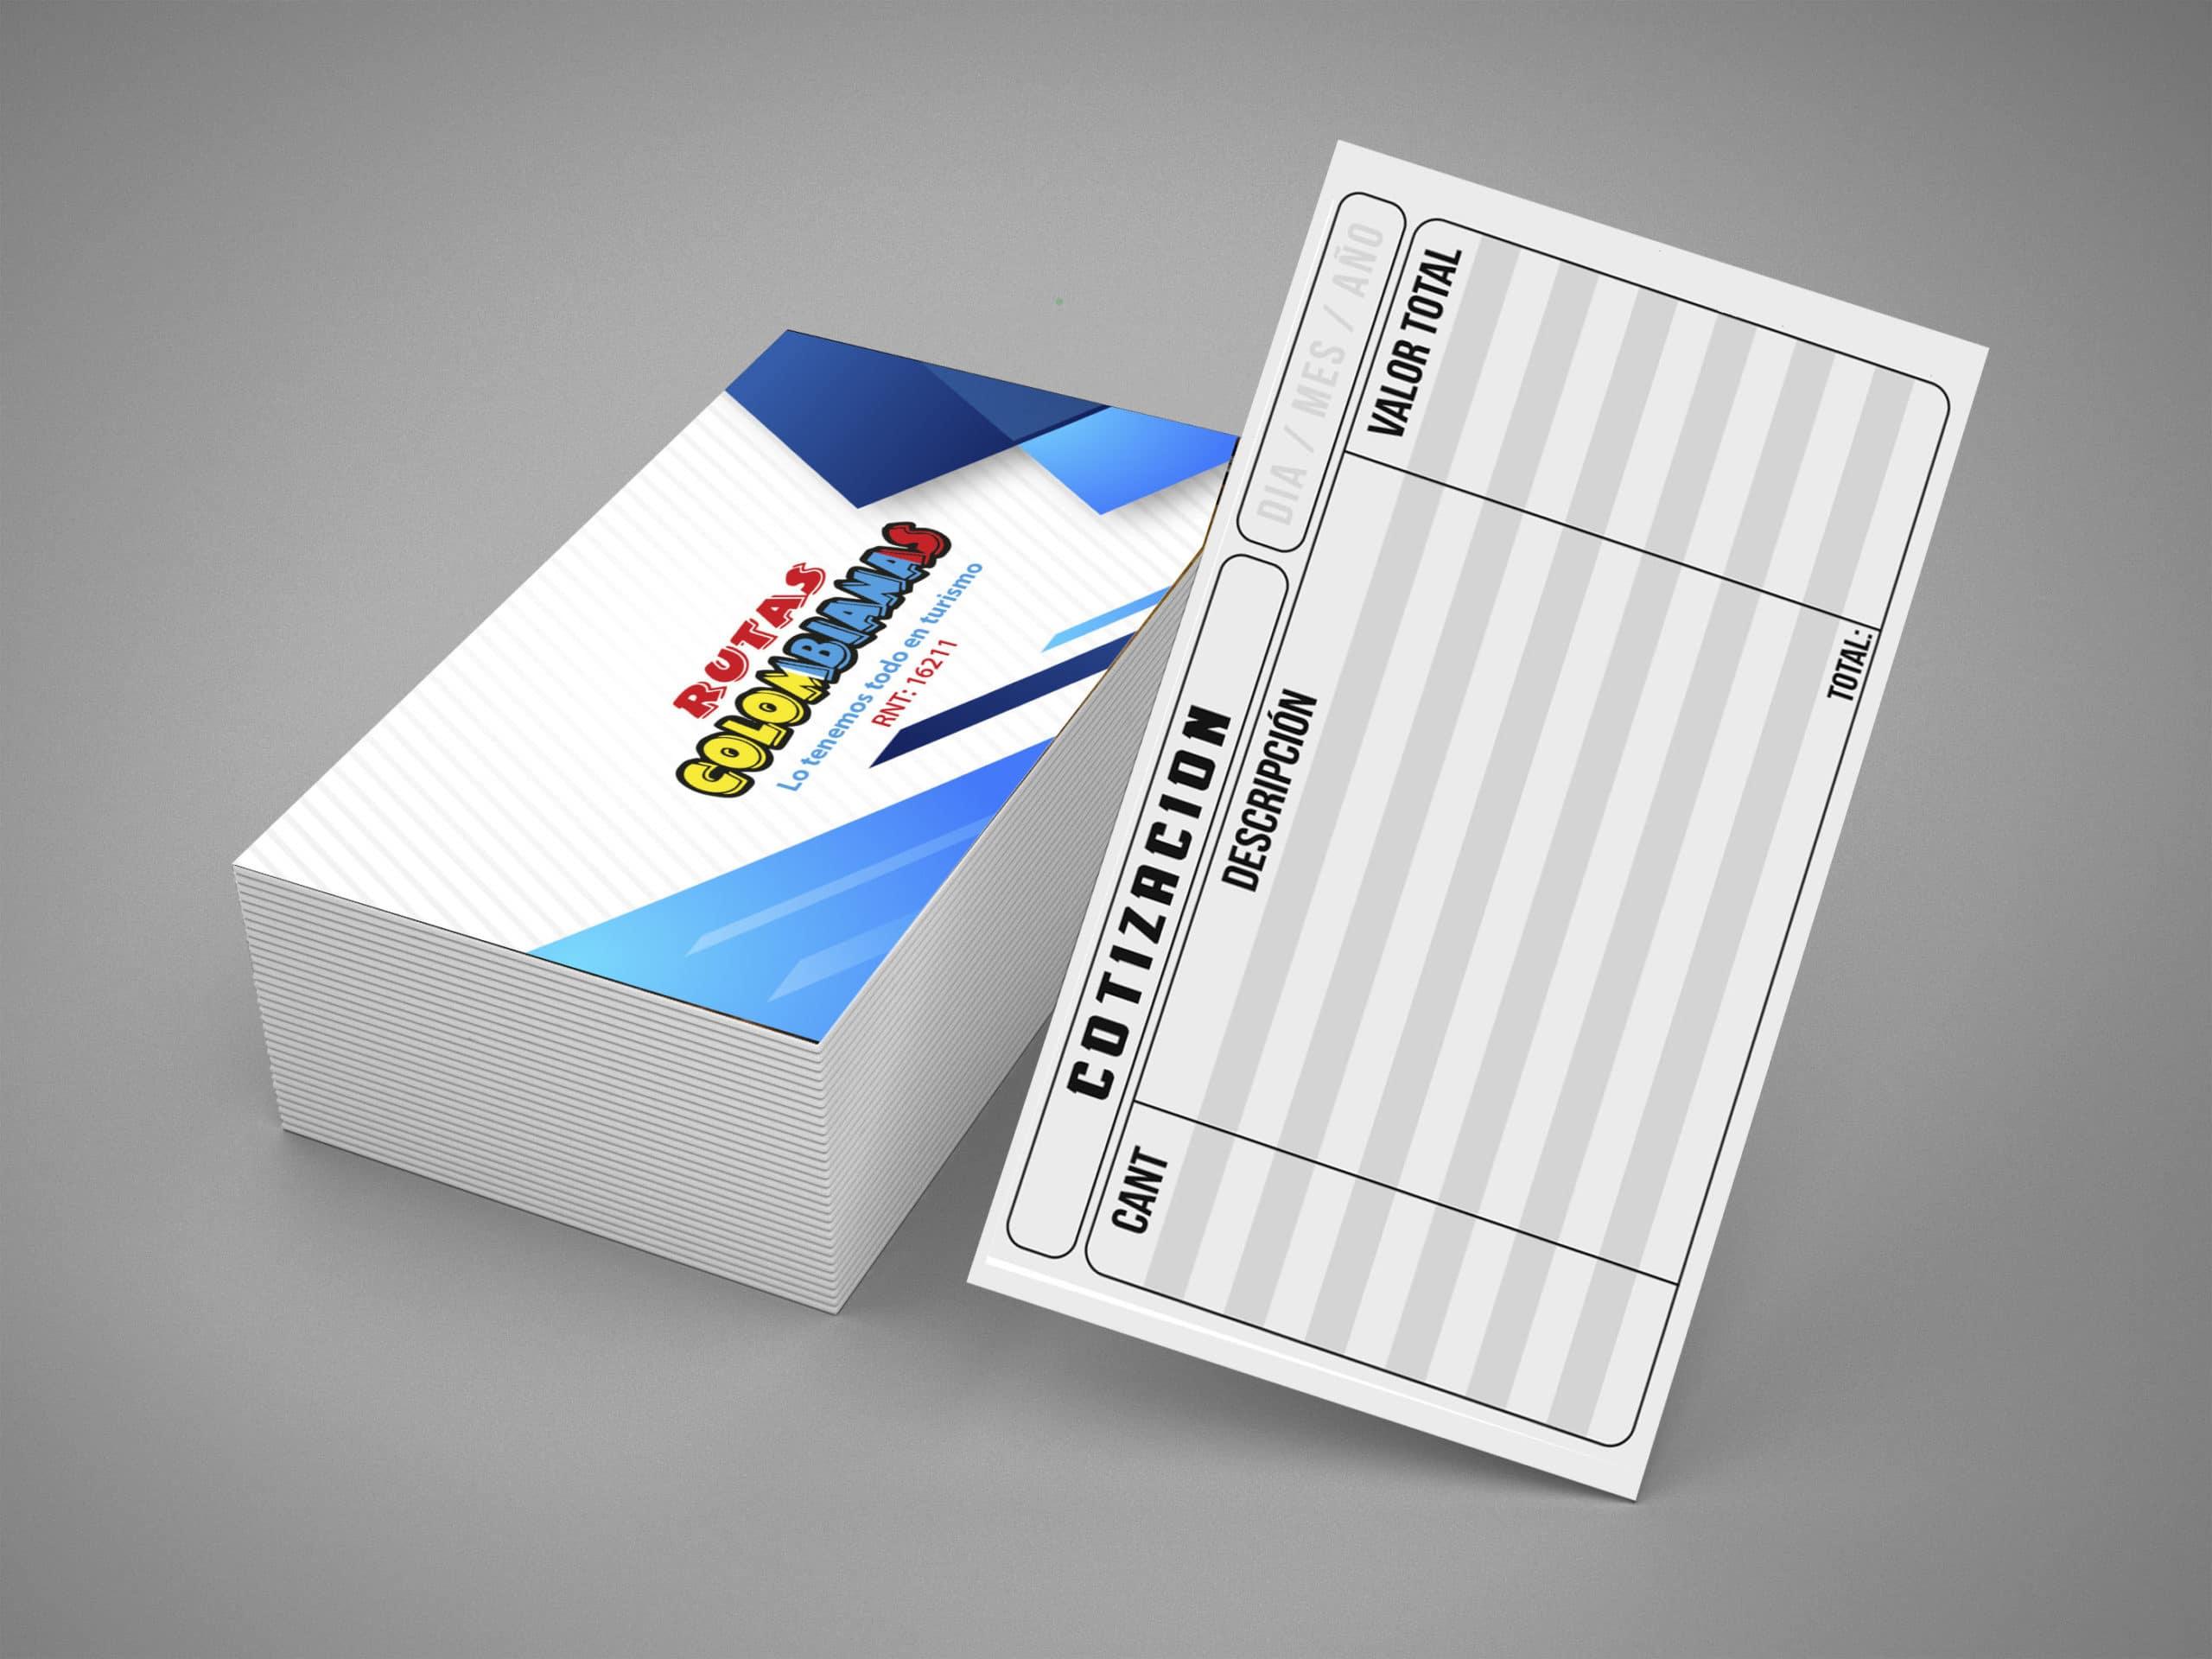 tarjeta de presentacion brillante